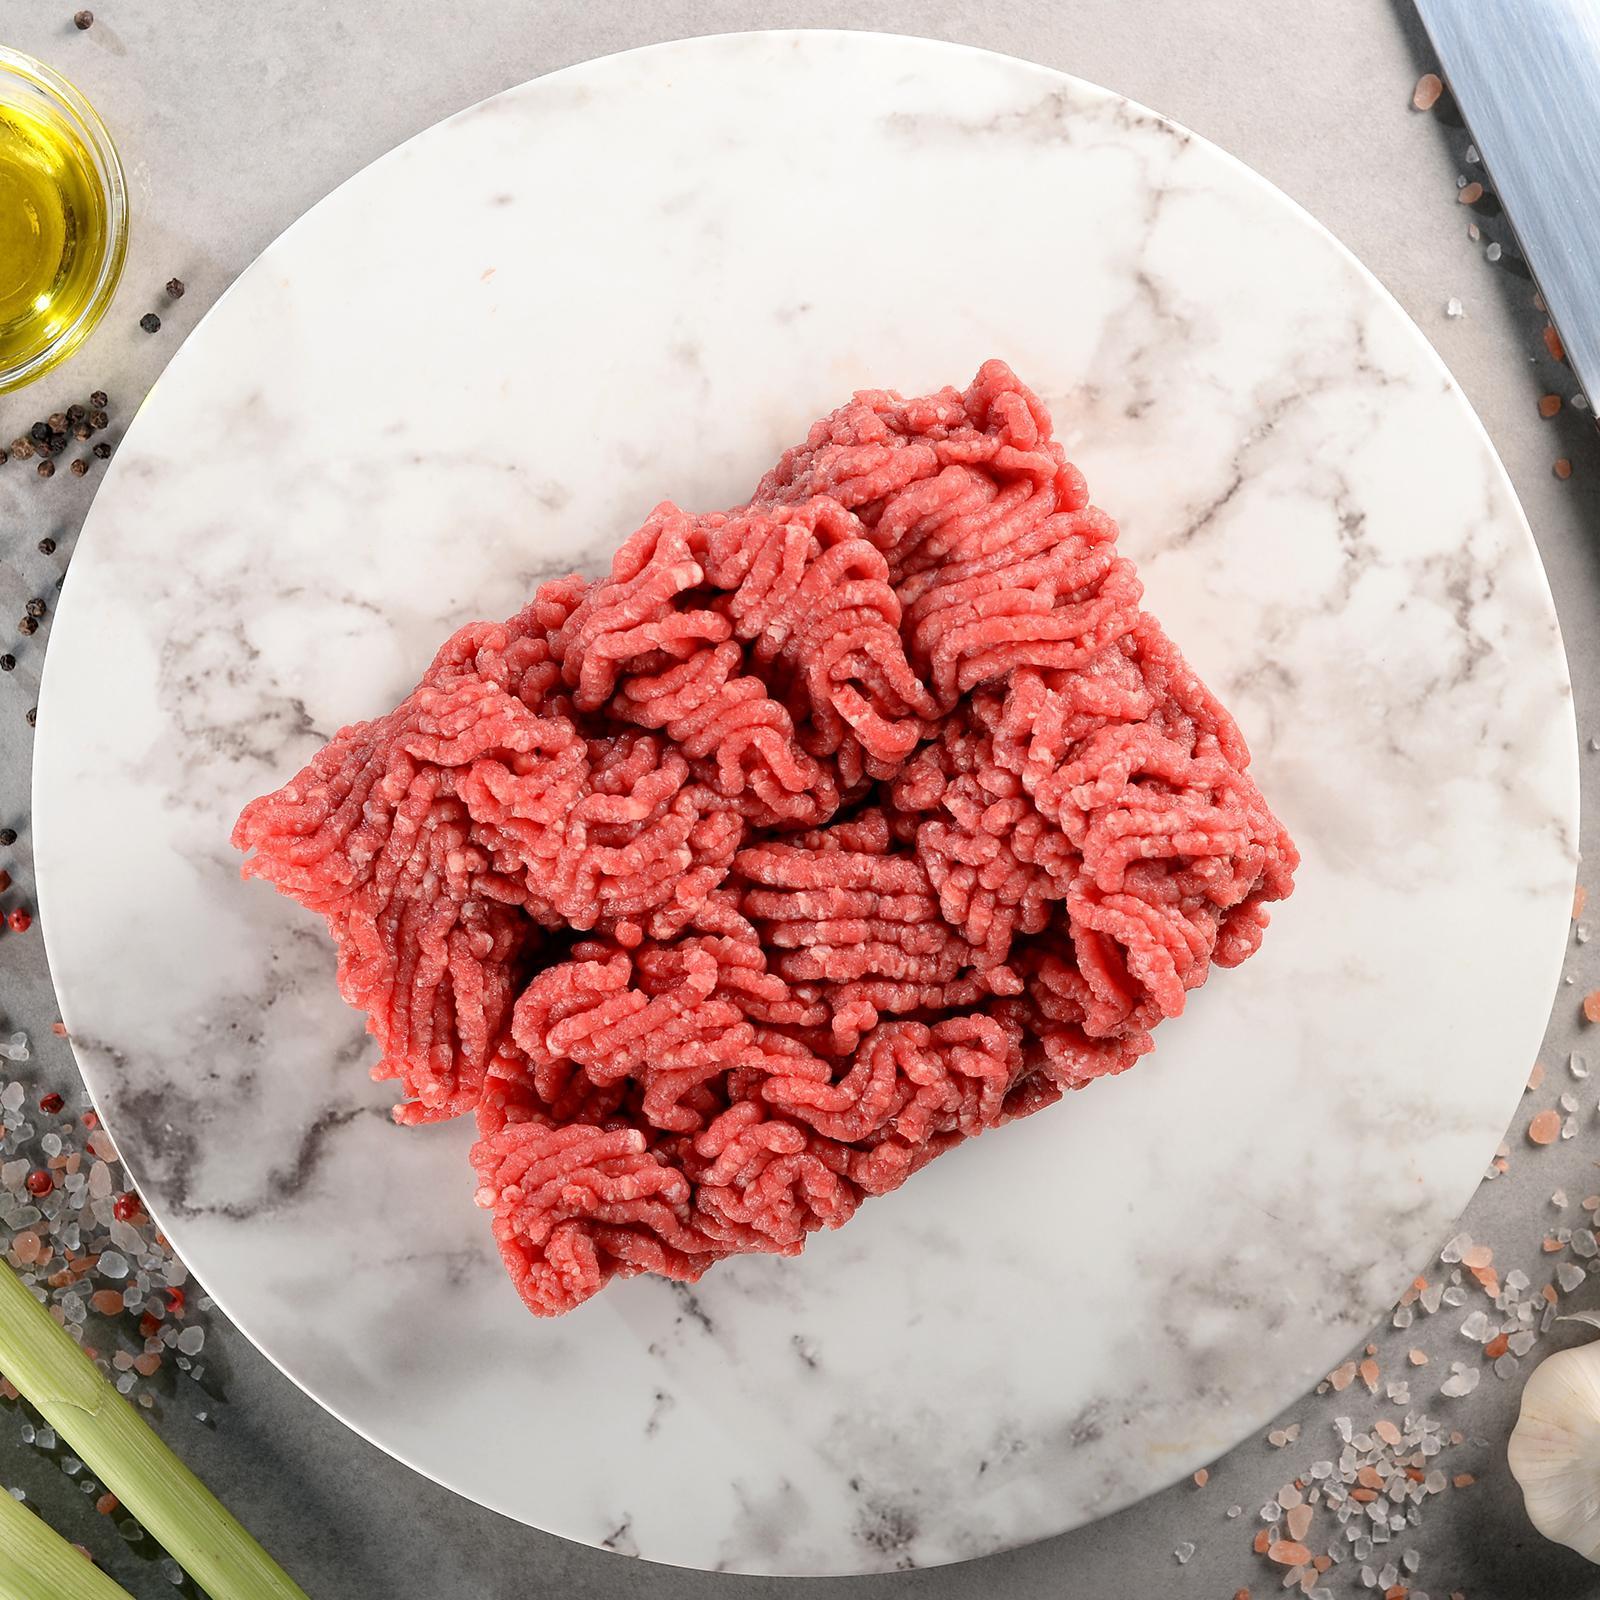 Ryan's Organic Black Angus Grass-Fed Beef Minced - Australia